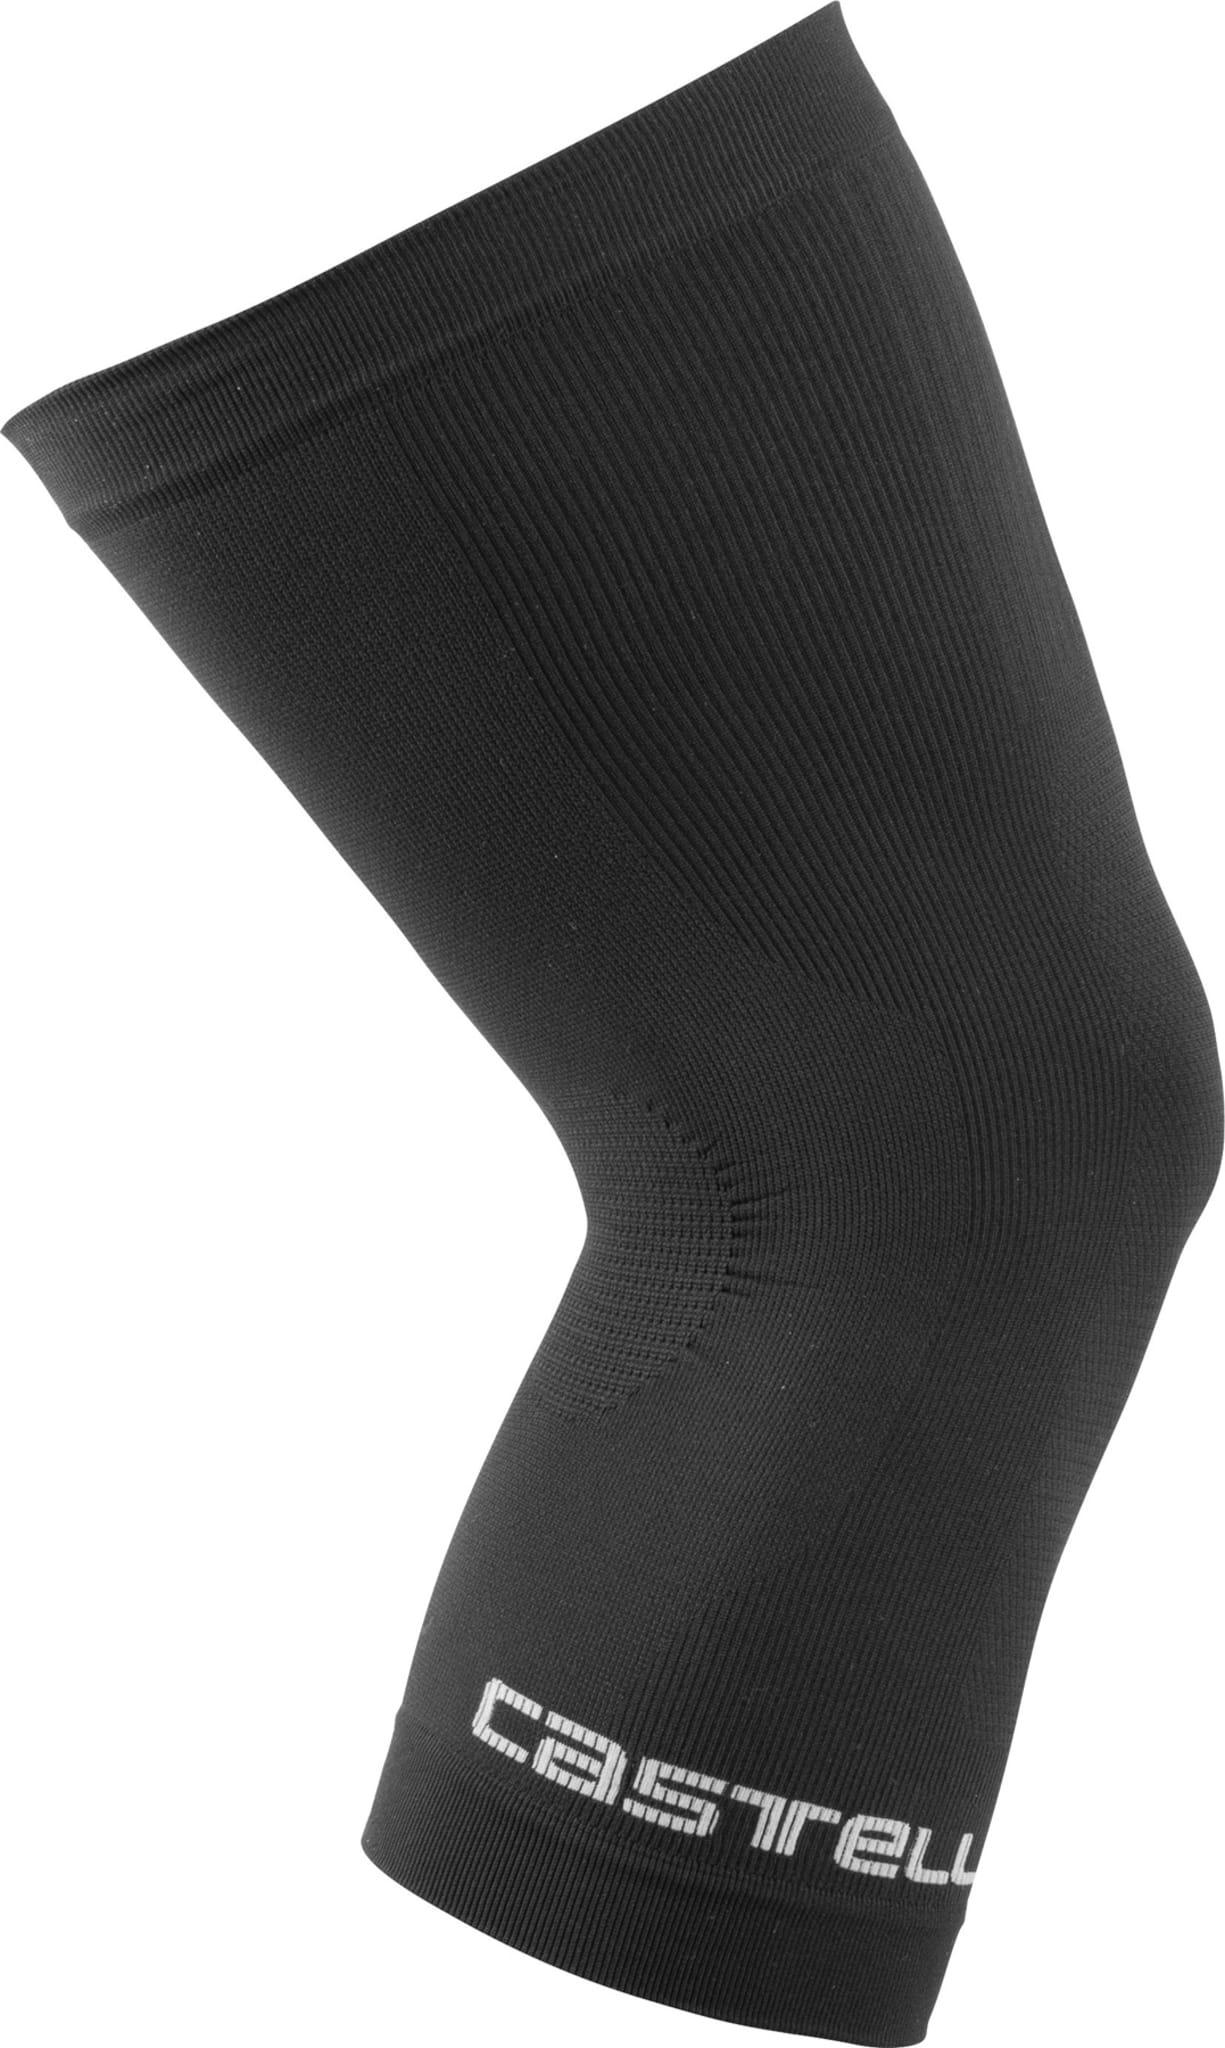 Pro Seamless Knee Warmer